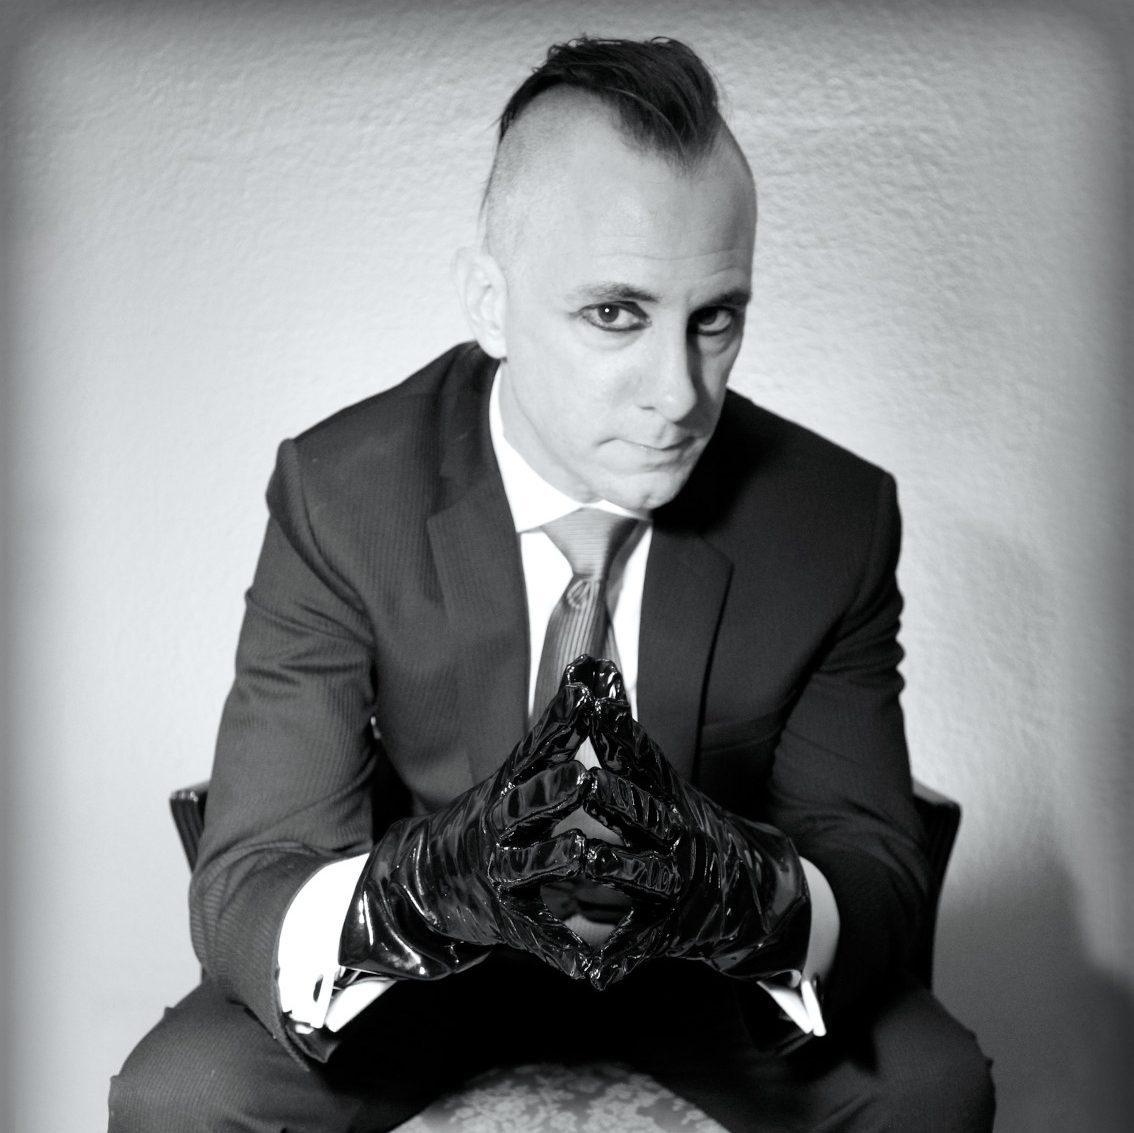 Pigface drummer Bradley Bills announces new Chant album and single